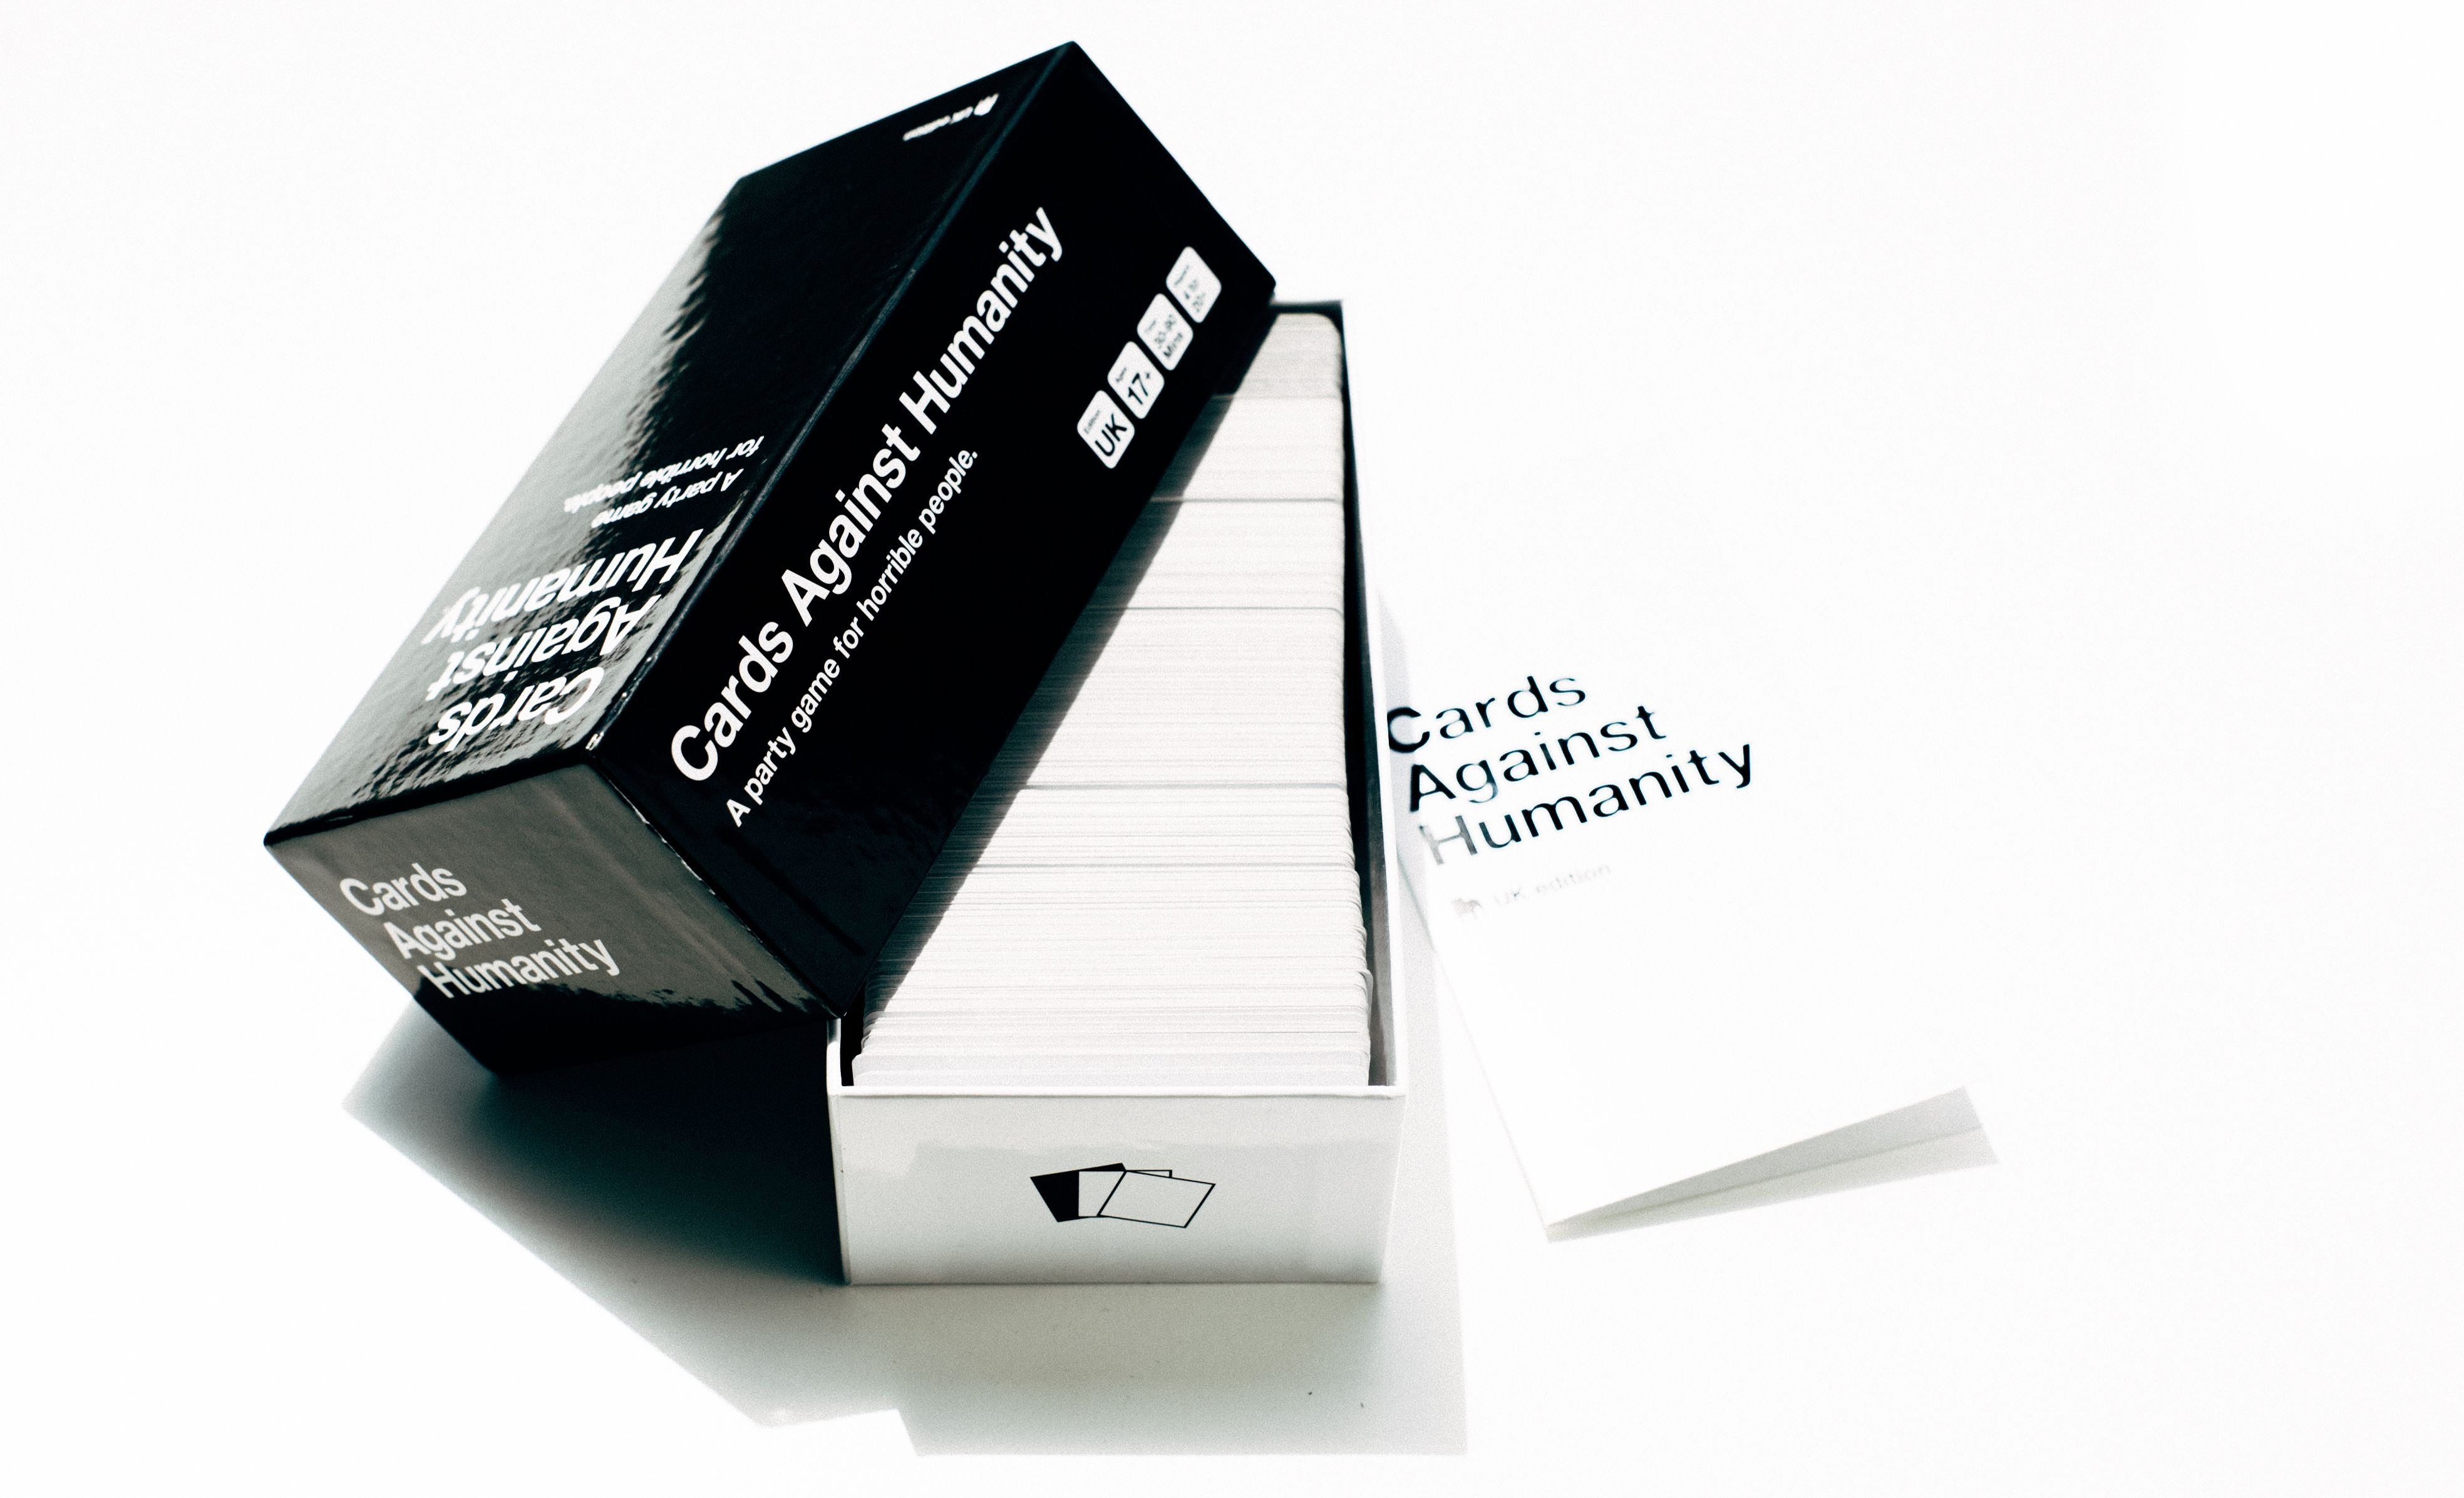 Cards Against Humanity Karten Gegen Die Menschlichkeit Cards Against Humanity Karten Die Menschlichkeit